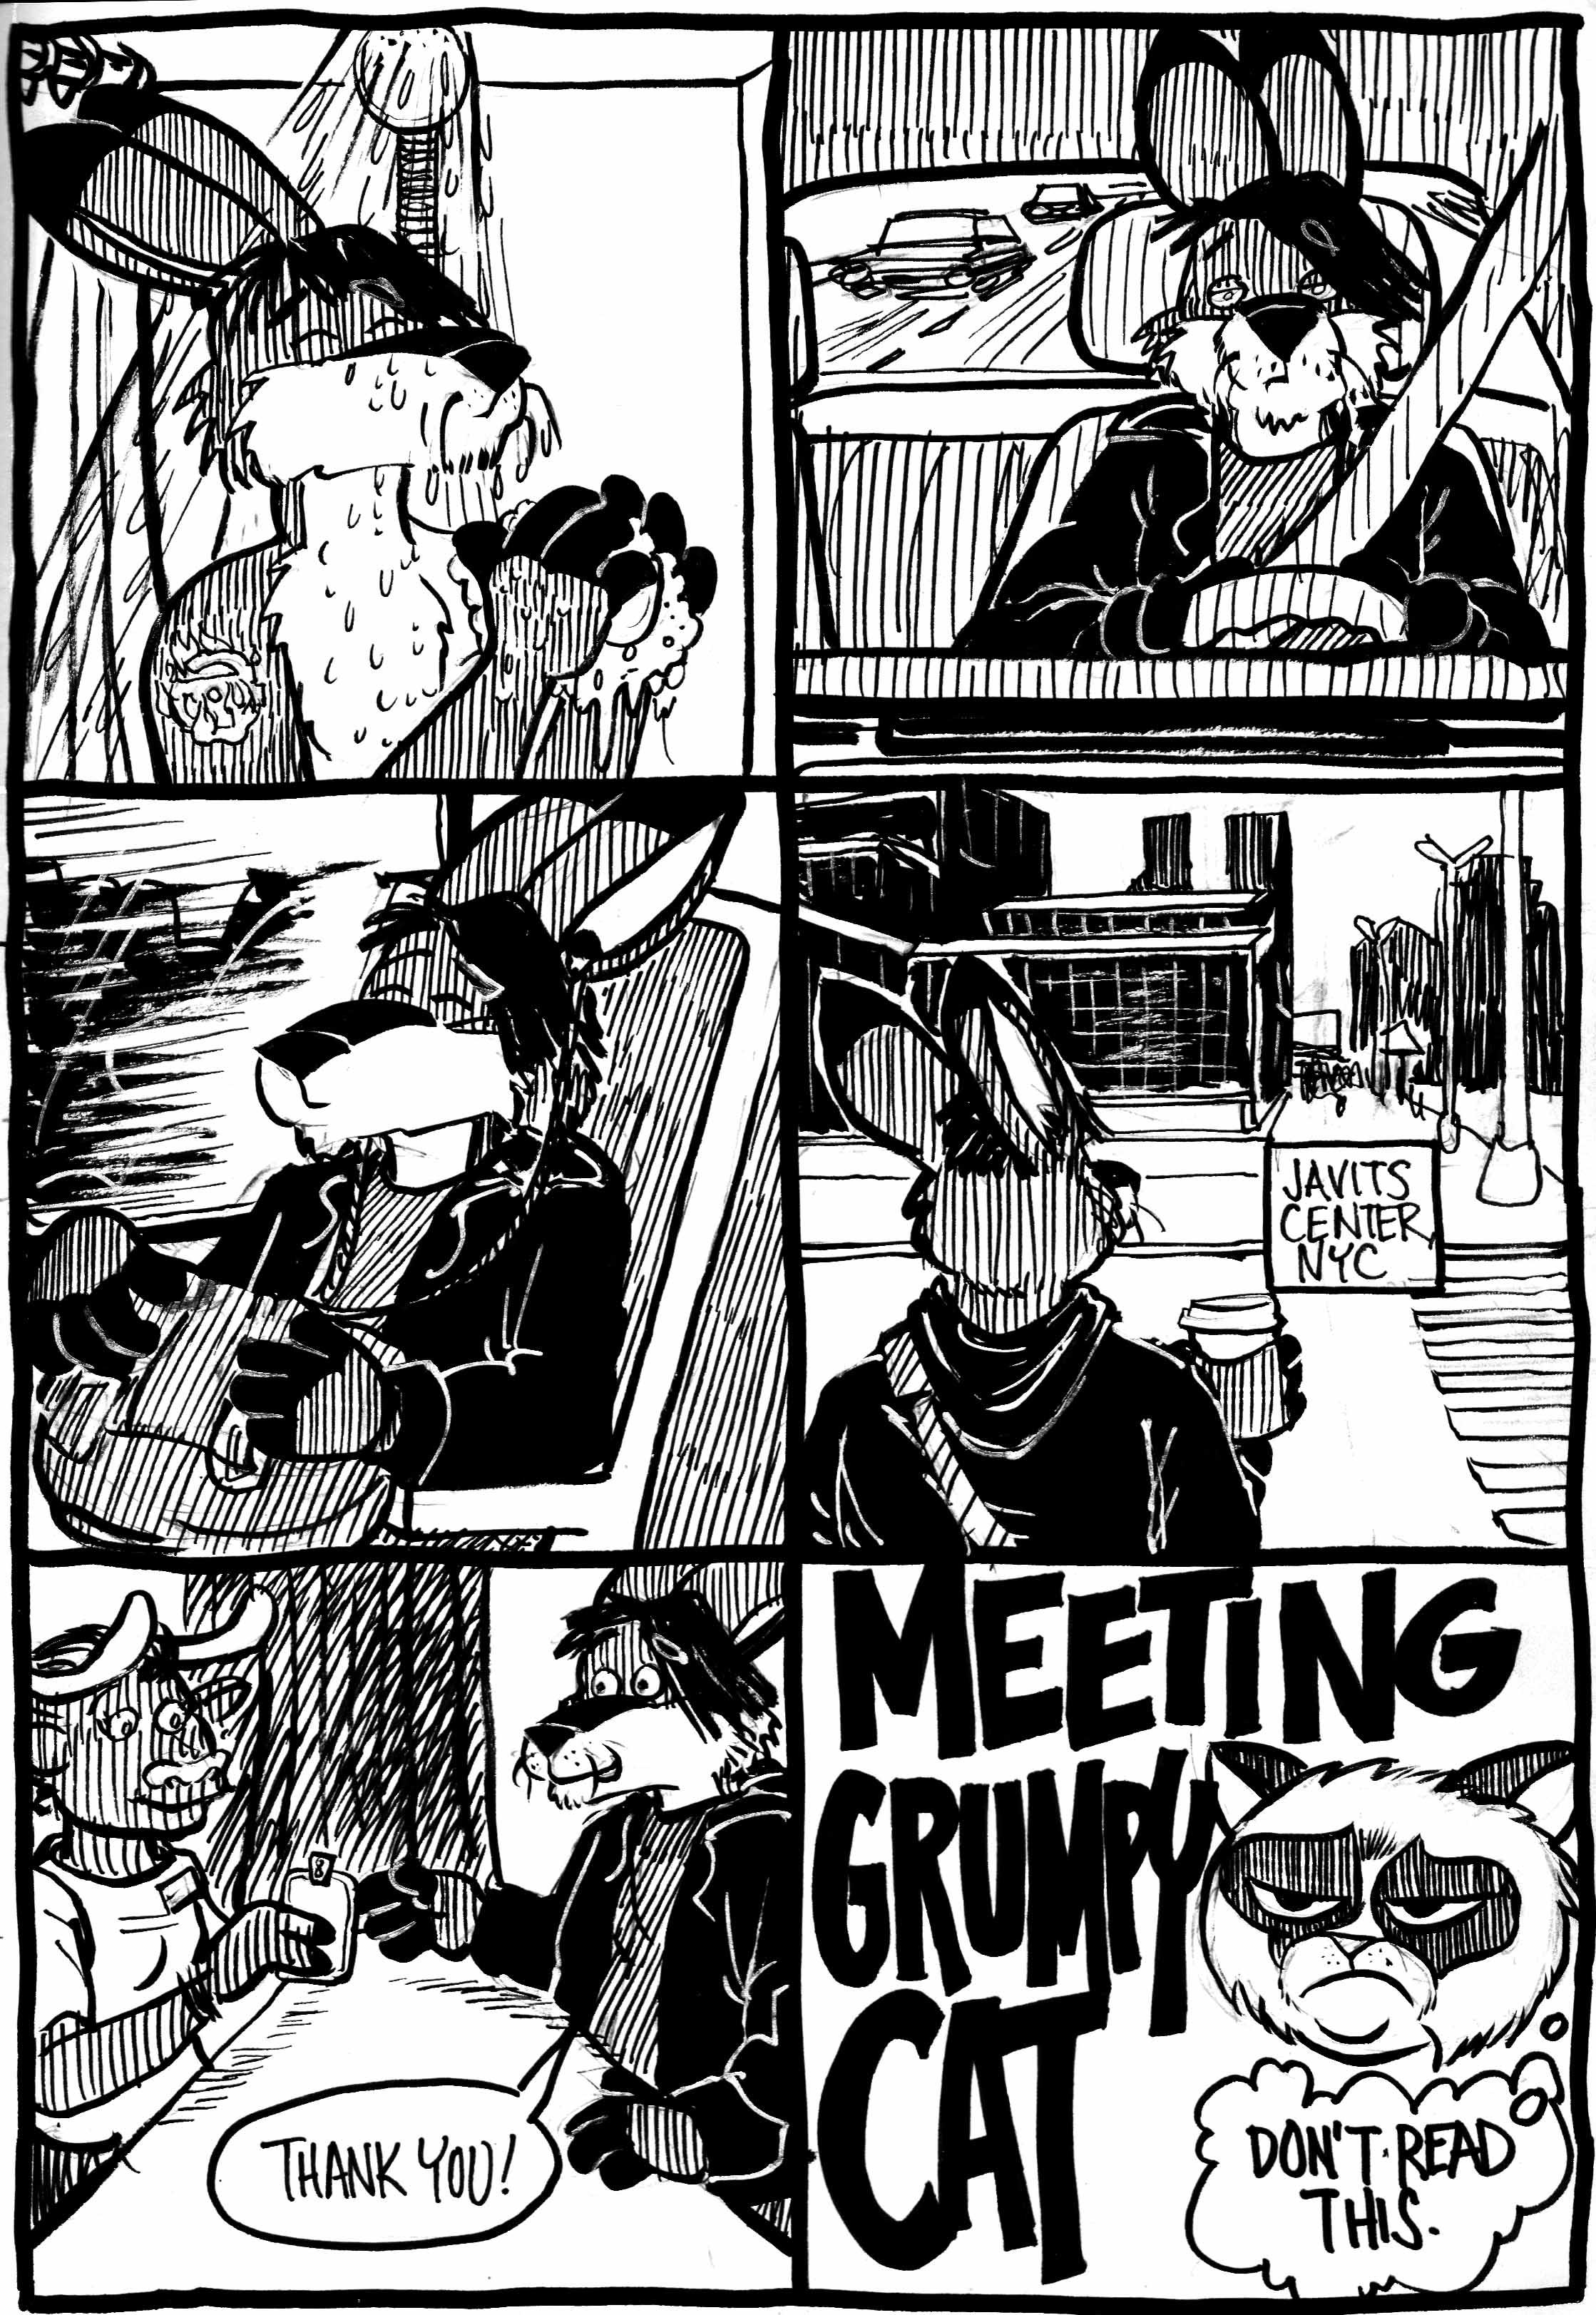 Meeting Grumpy Cat Part 1